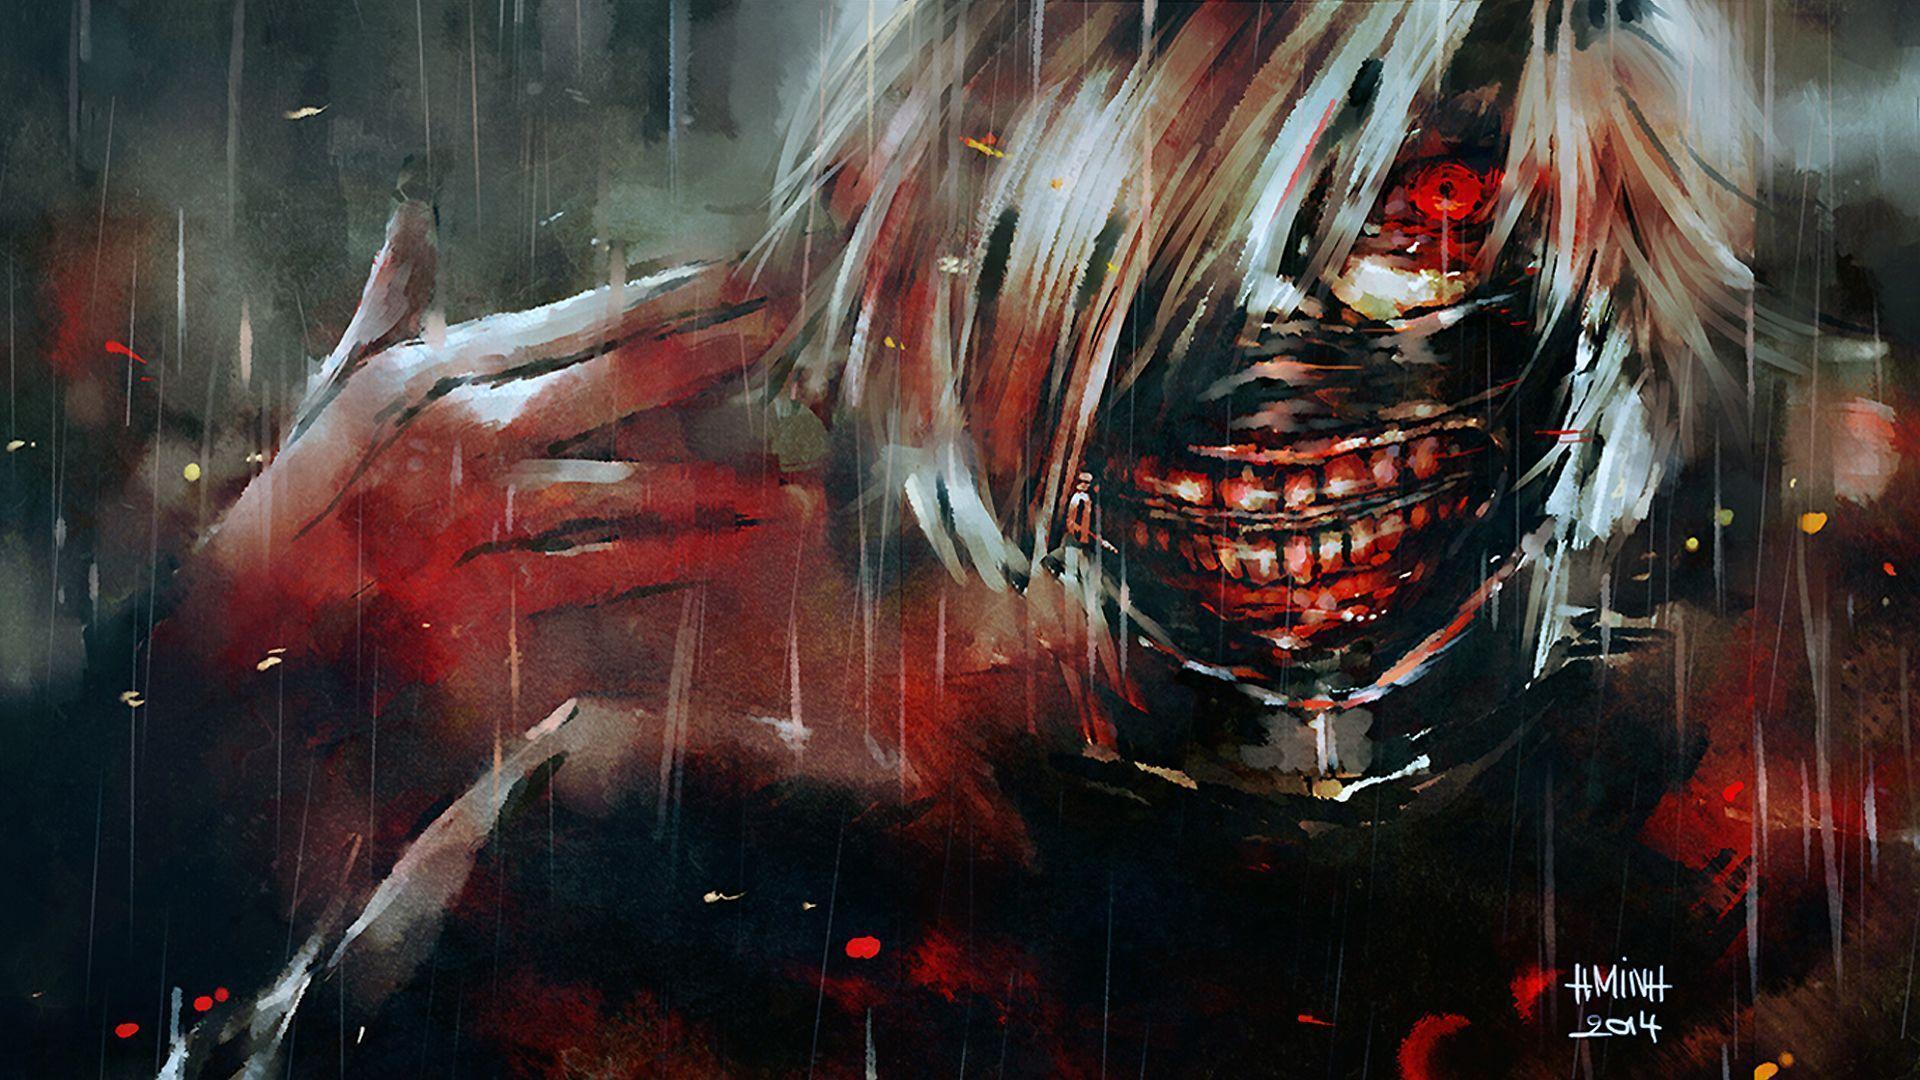 Tokyo Ghoul Wallpapers - Wallpaper Cave